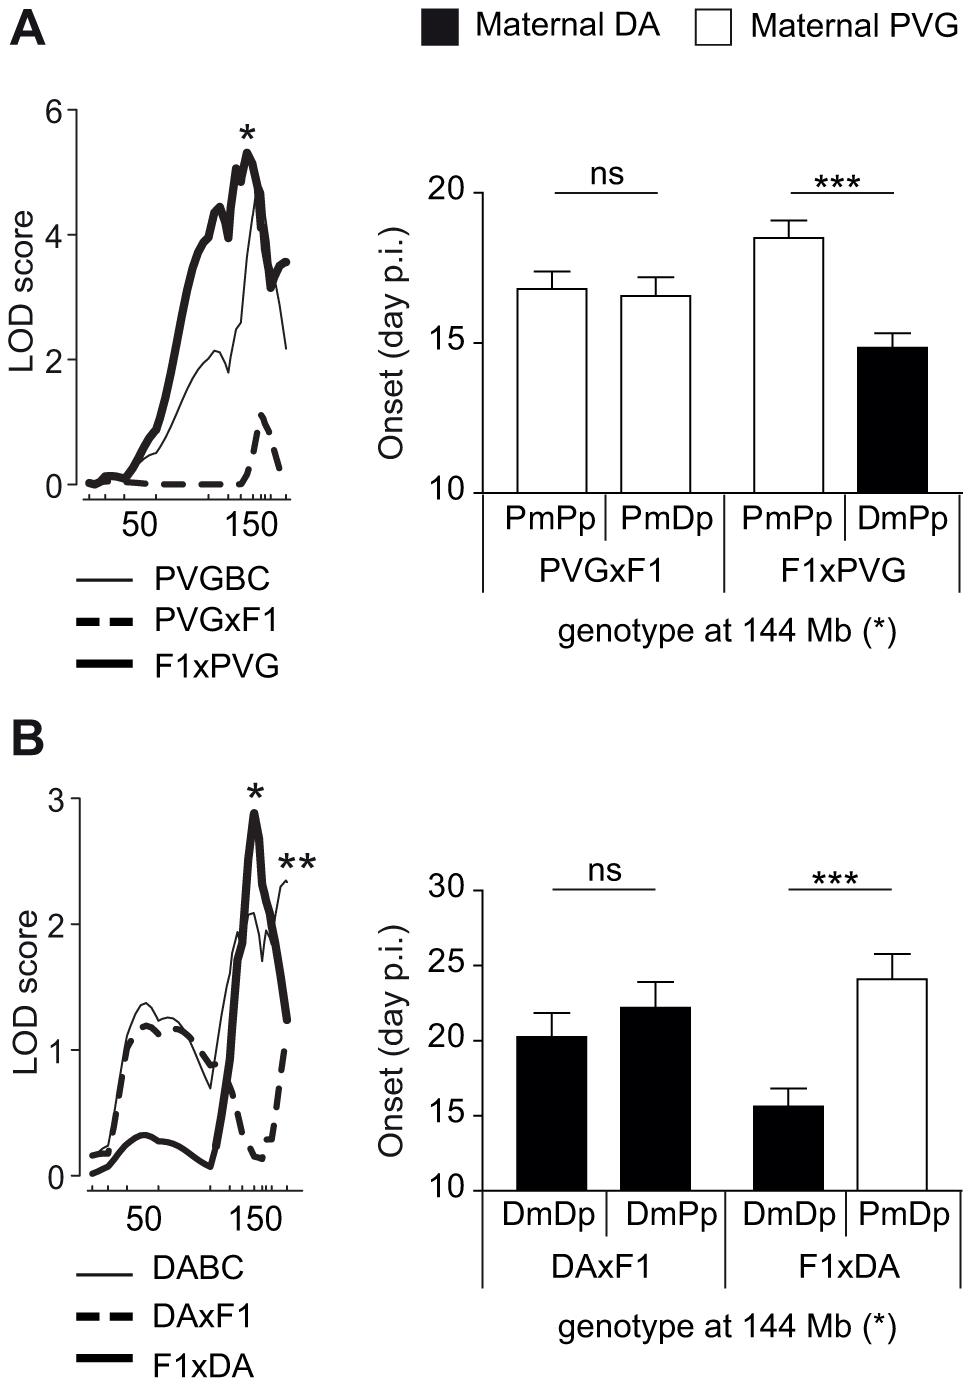 Maternal transmission of the disease-predisposing allele.